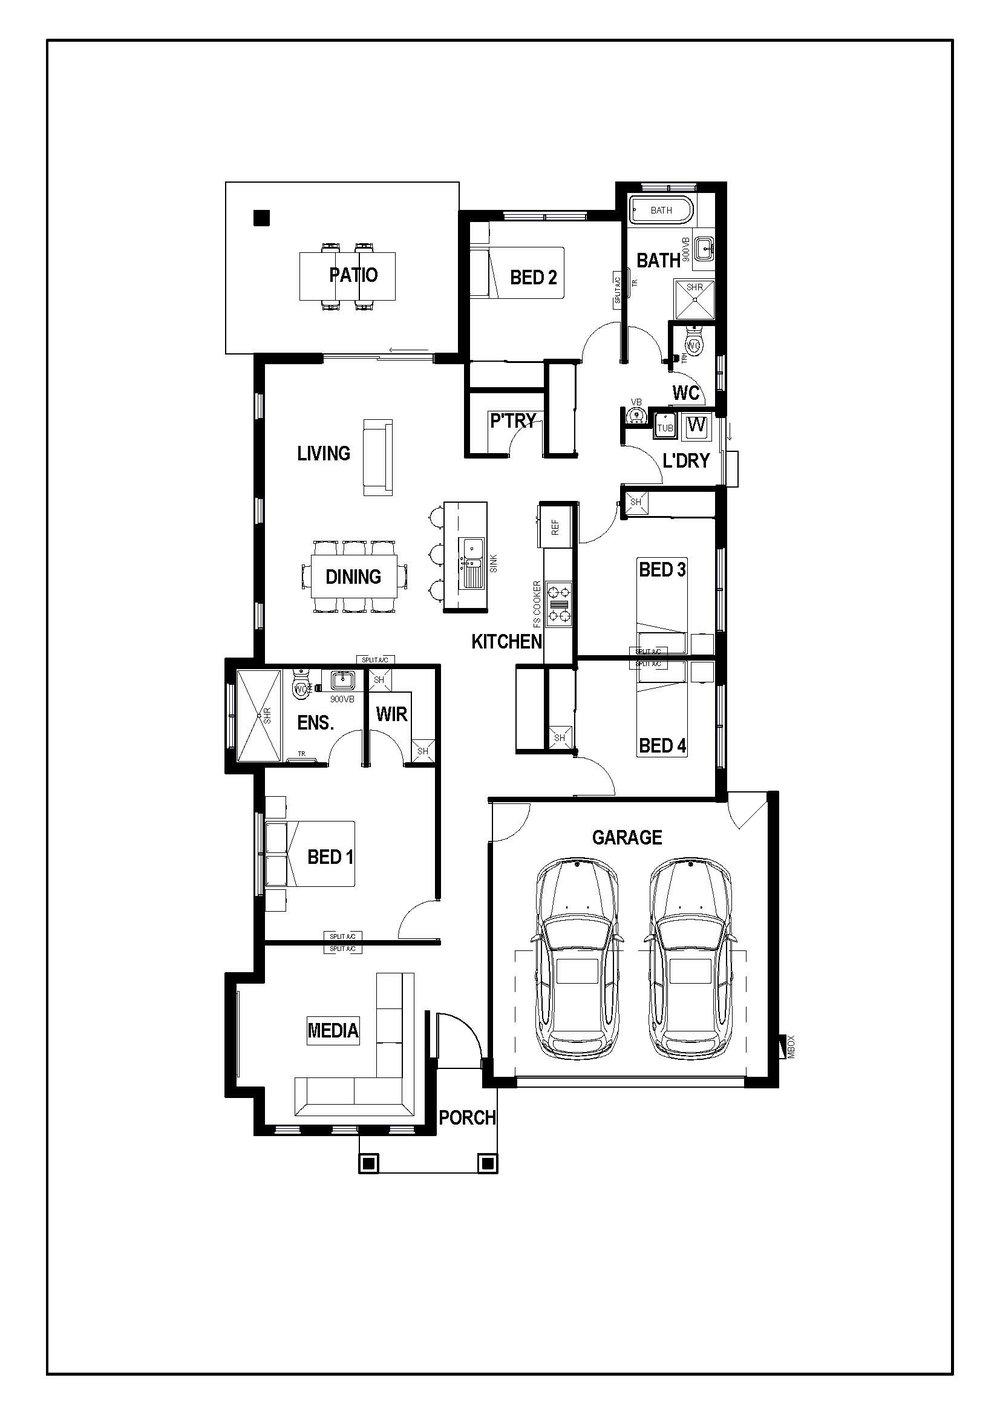 Areca A Floorplan.jpg